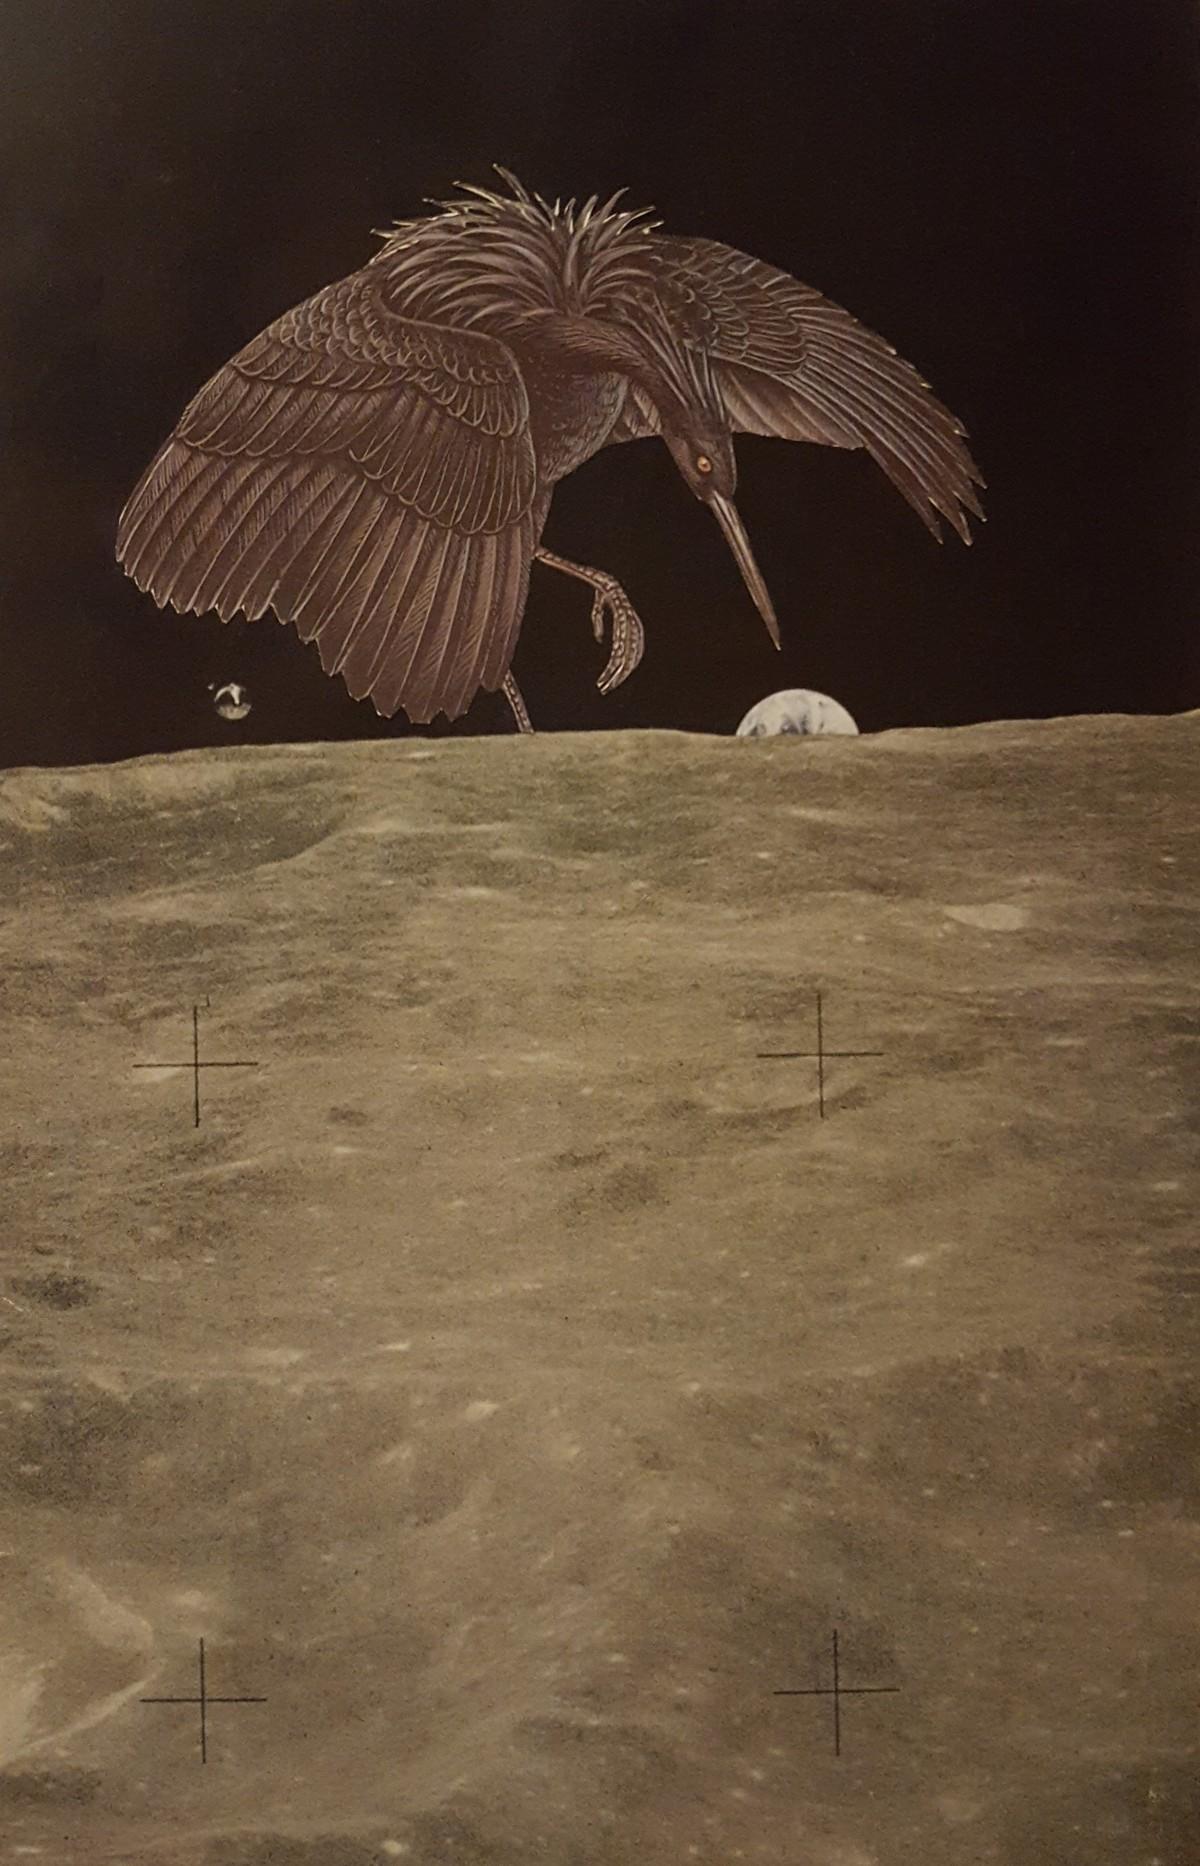 collage-bird-moon-earth.jpg